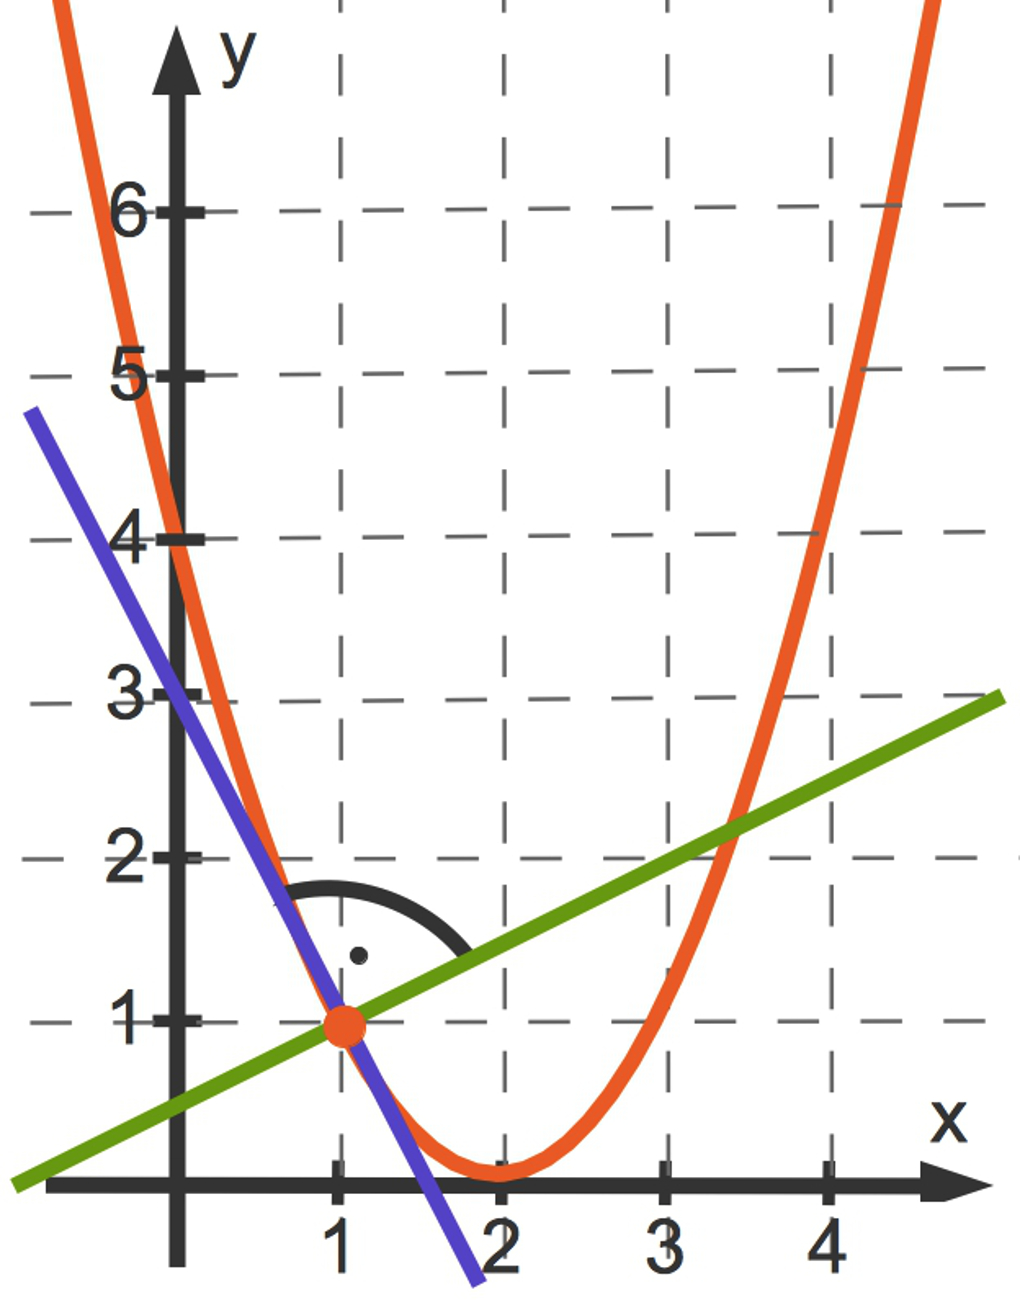 1040_f(x)_x_2-4x_4_Normale.jpg